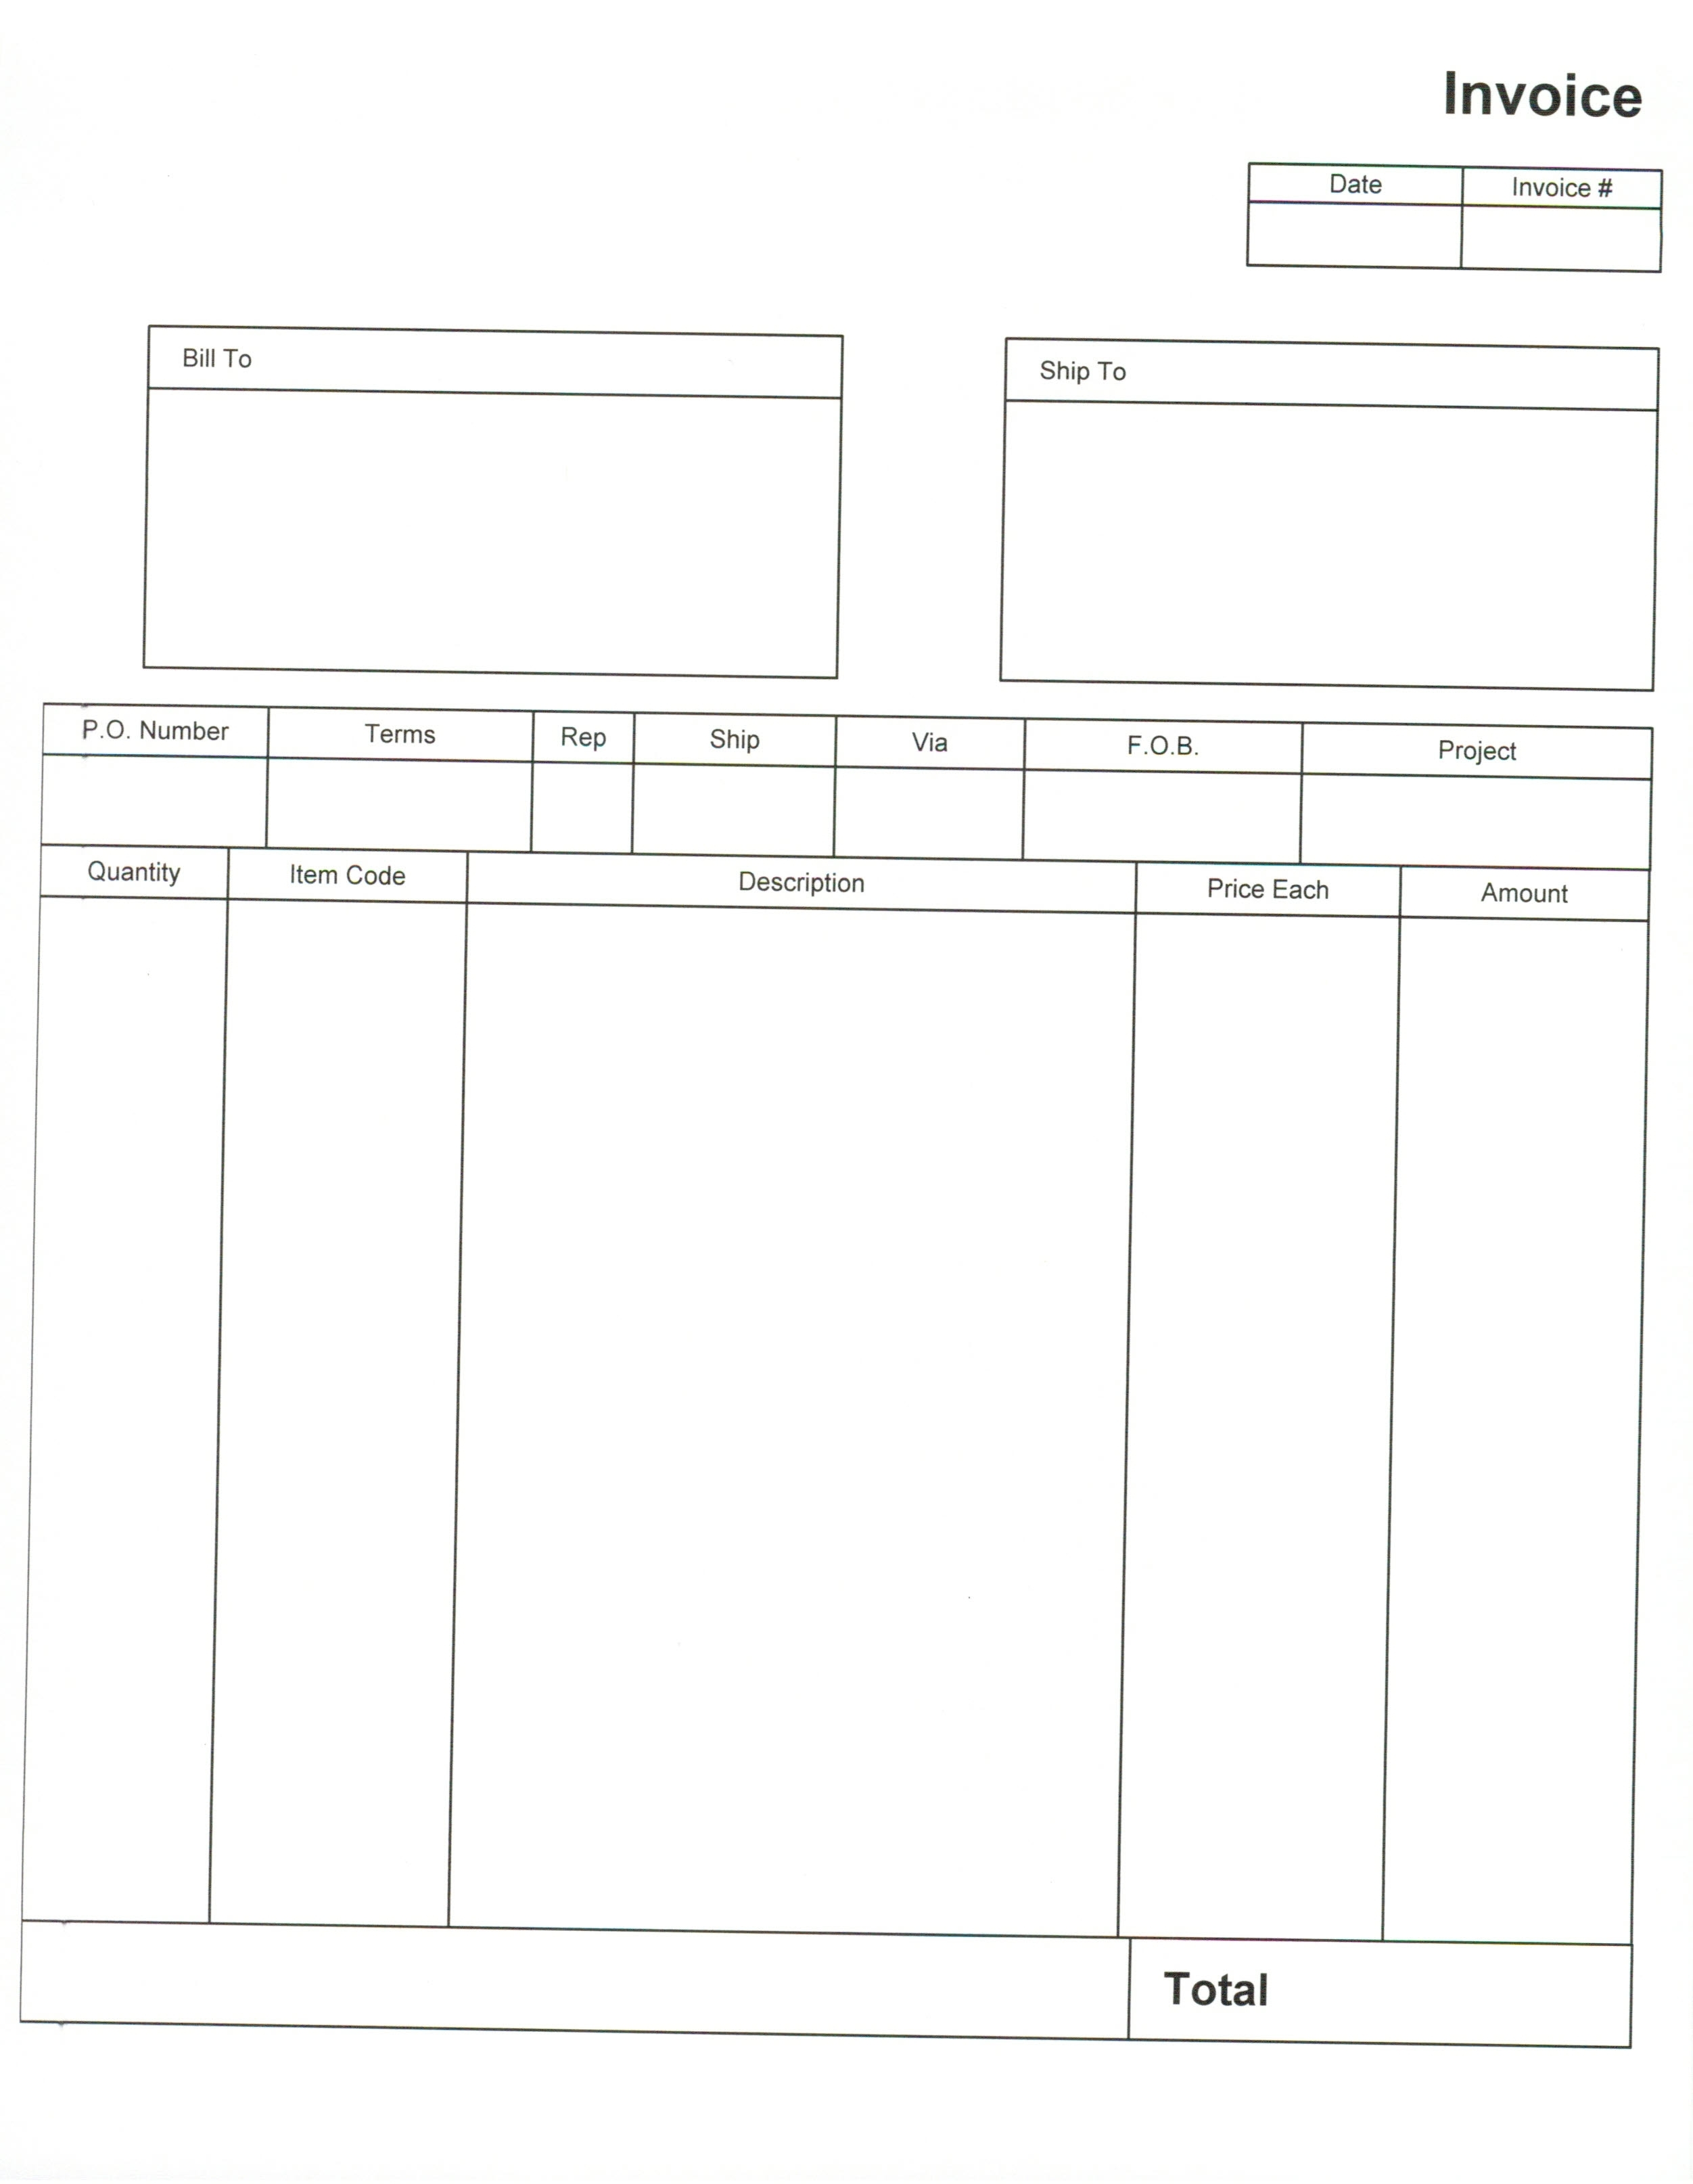 blank invoice pdf invoice template free 2016 blank invoice form pdf